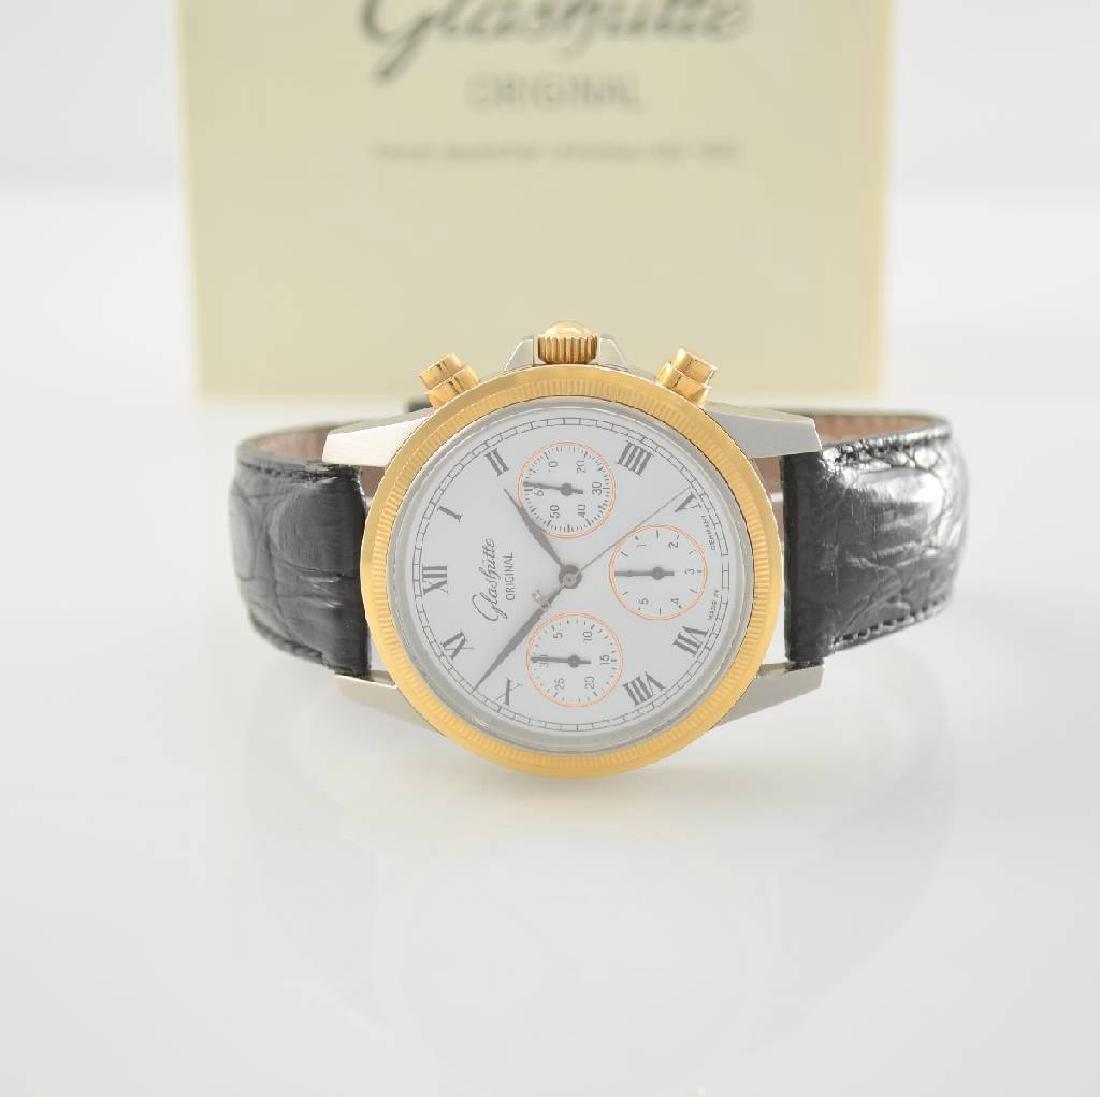 GLASHUTTE ORIGINAL gents wristwatch with chronograph